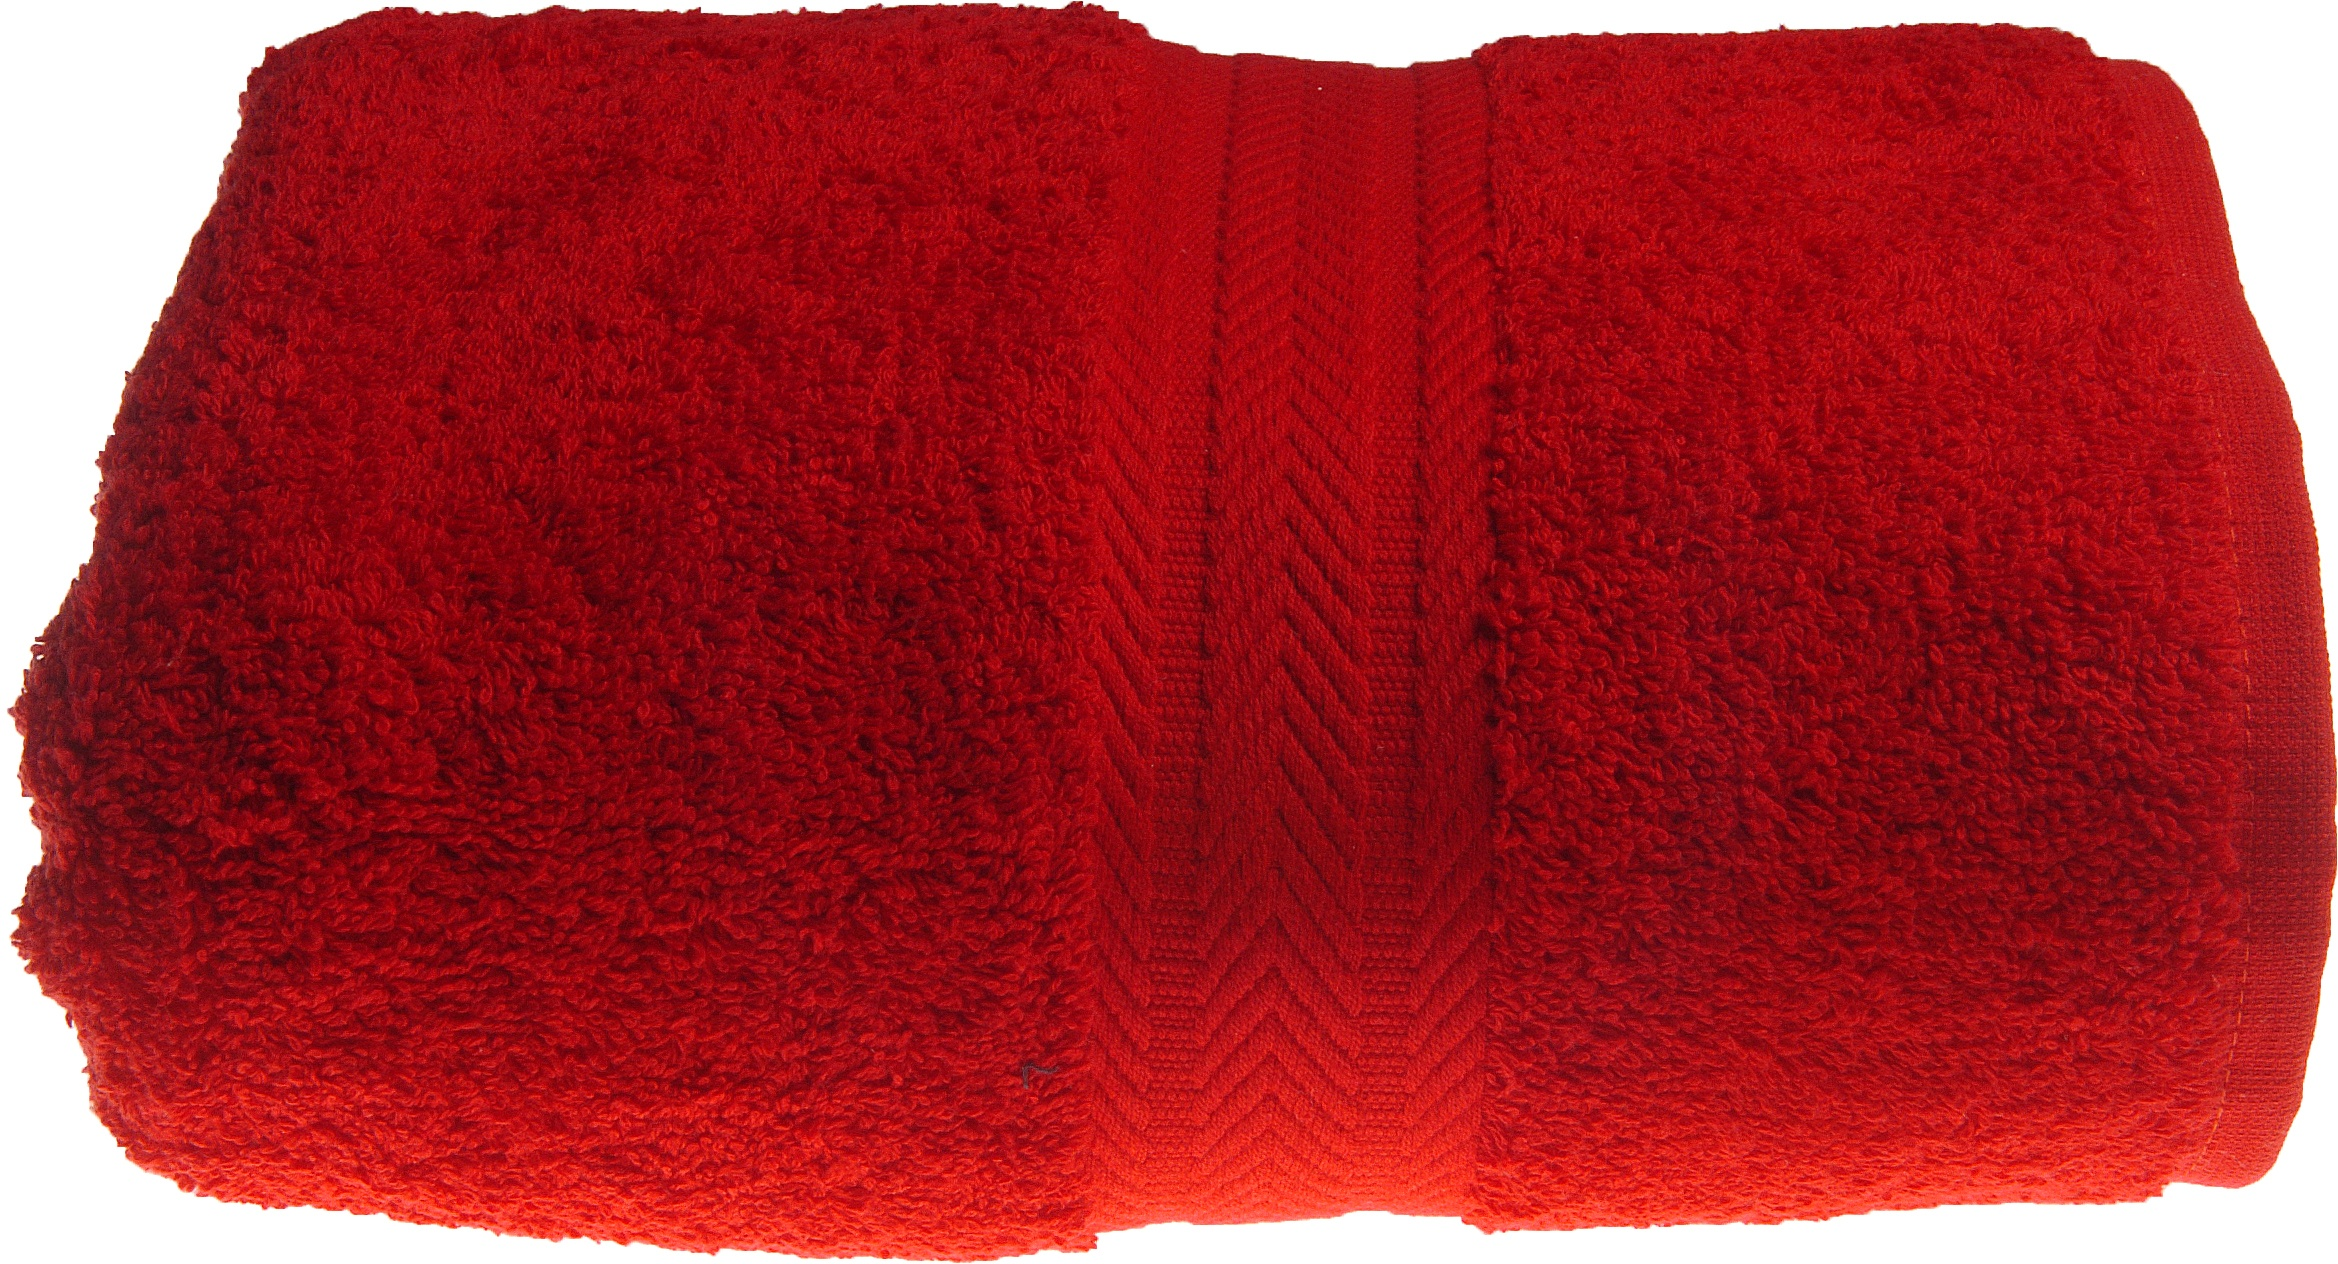 Drap de bain 100 x 150 cm en Coton couleur Rubis (Rubis)